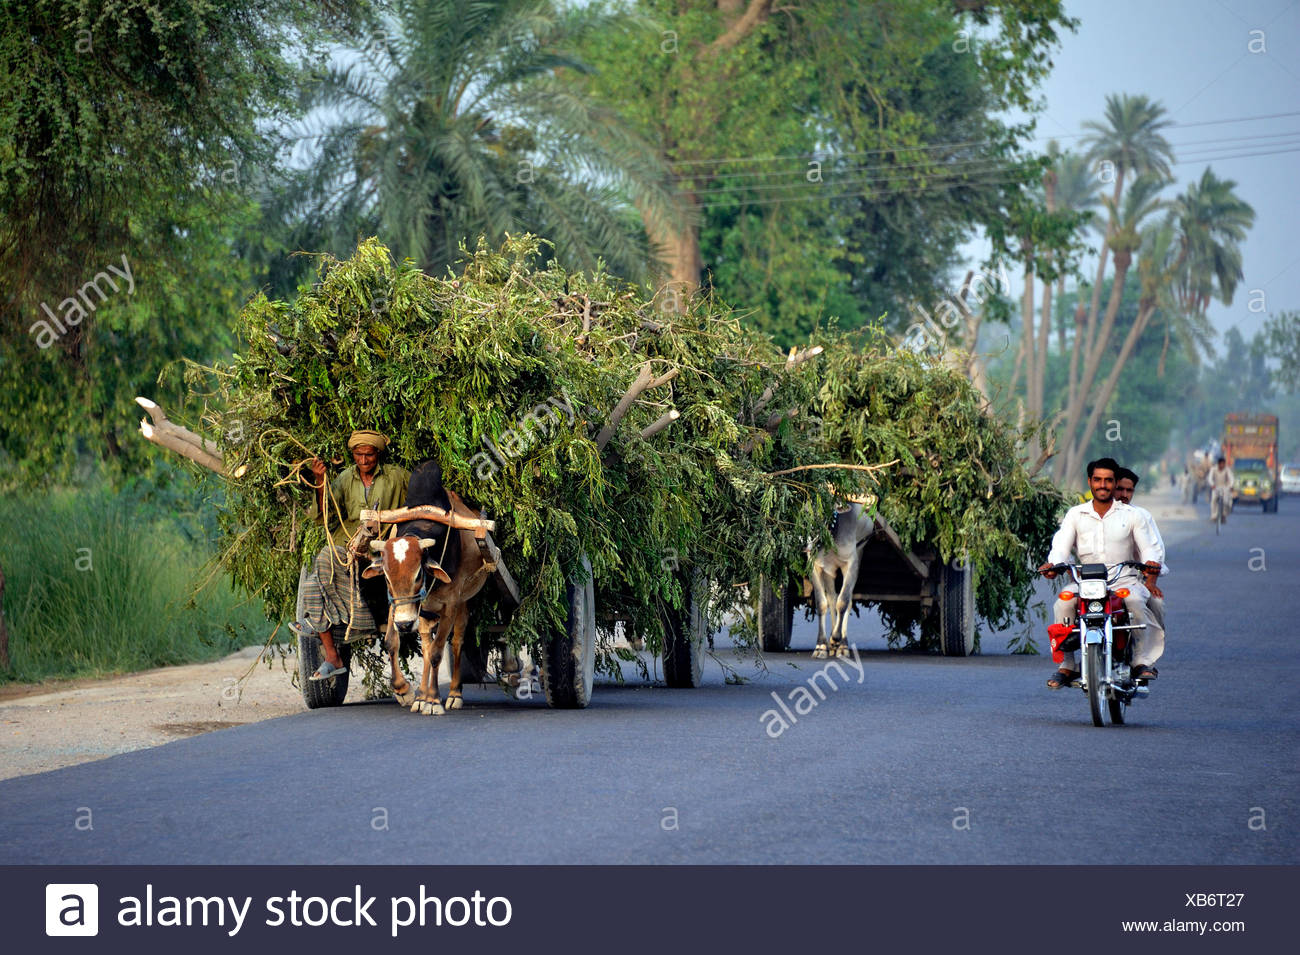 Motorbike and bullock carts, different means of transportation on a paved road near Muzaffaragarh, Punjab, Pakistan, Asia - Stock Image